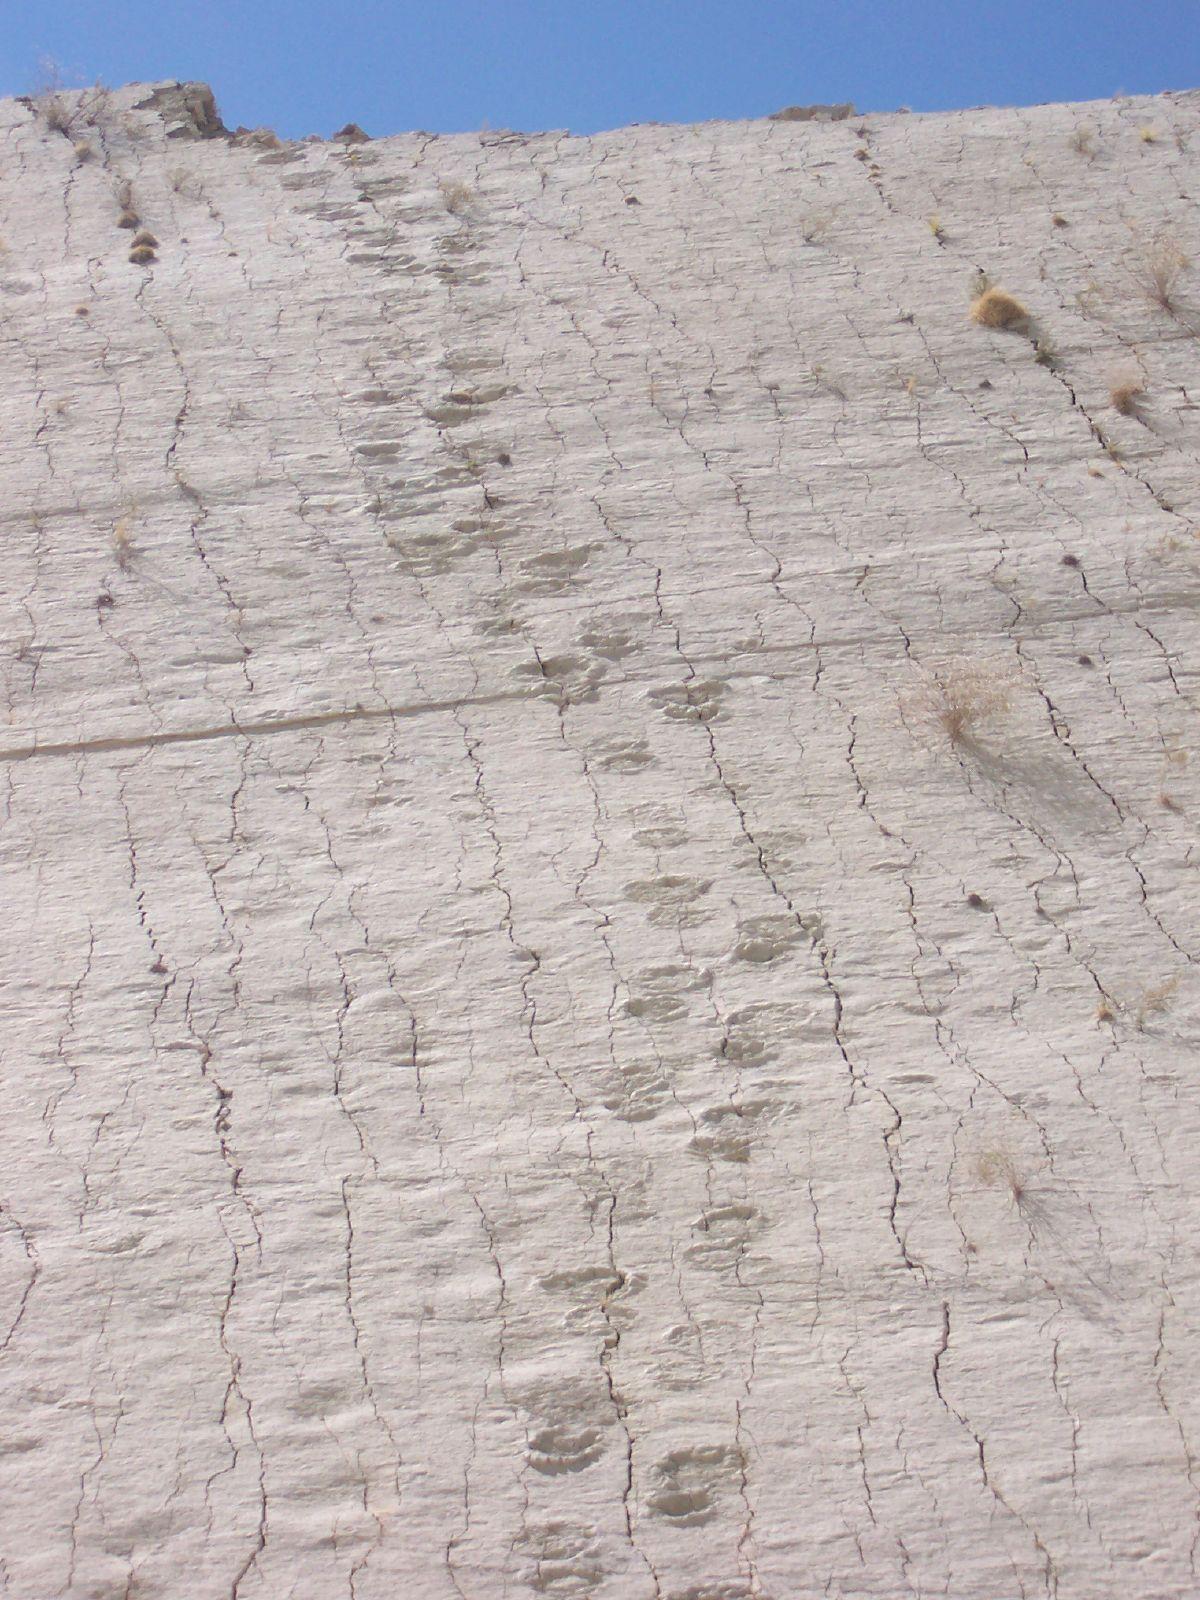 Dinosaur tracks in Bolivia 1.jpg